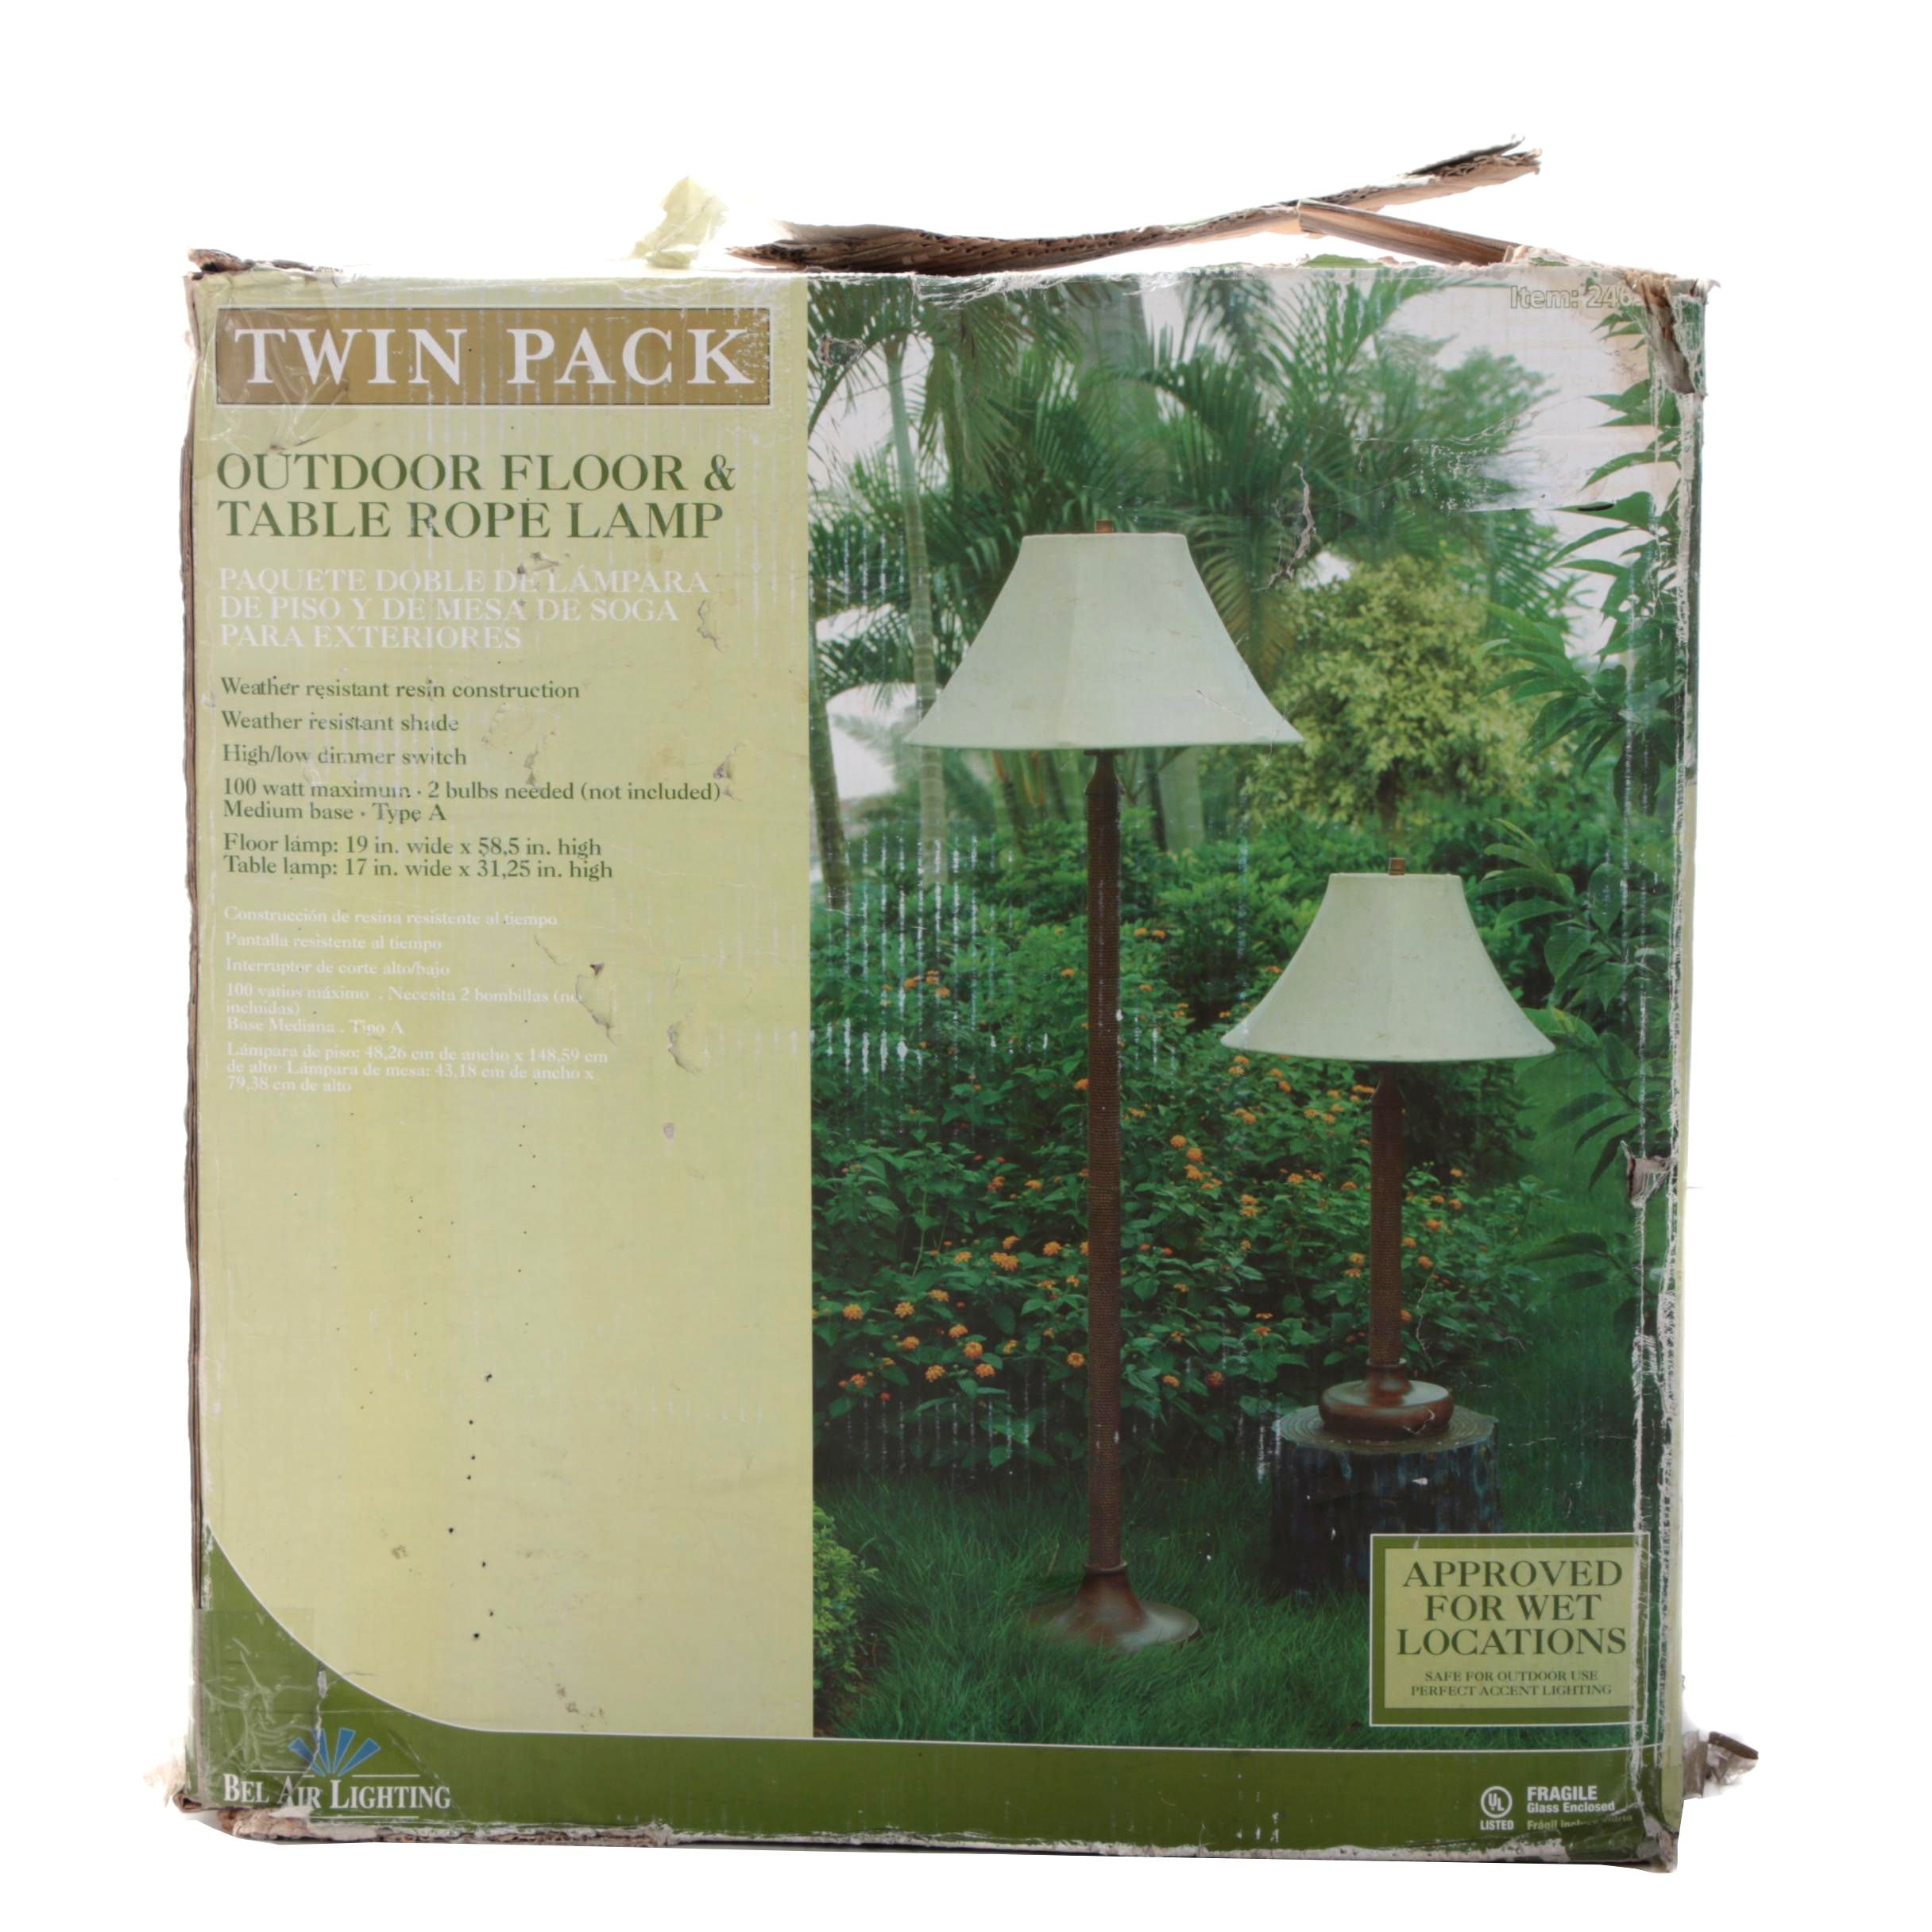 Bel Air Lighting Outdoor Floor Lamp and Table Lamp